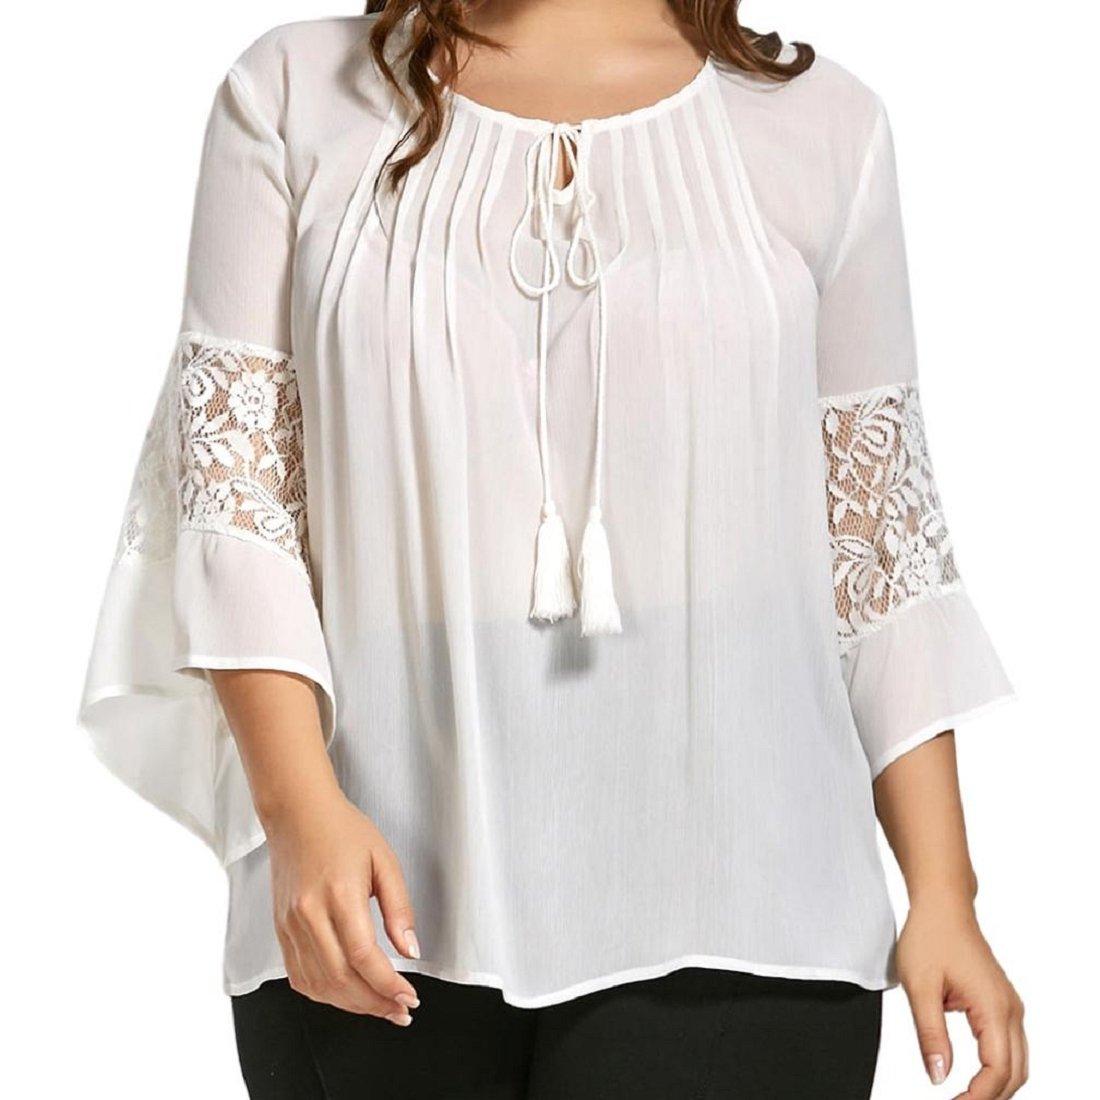 b93efc371a3c34 GONKOMA Plus Size Women Lace Chiffon Three Quarter Sleeve Loose Fit Shirt  Tops Blouse at Amazon Women's Clothing store: